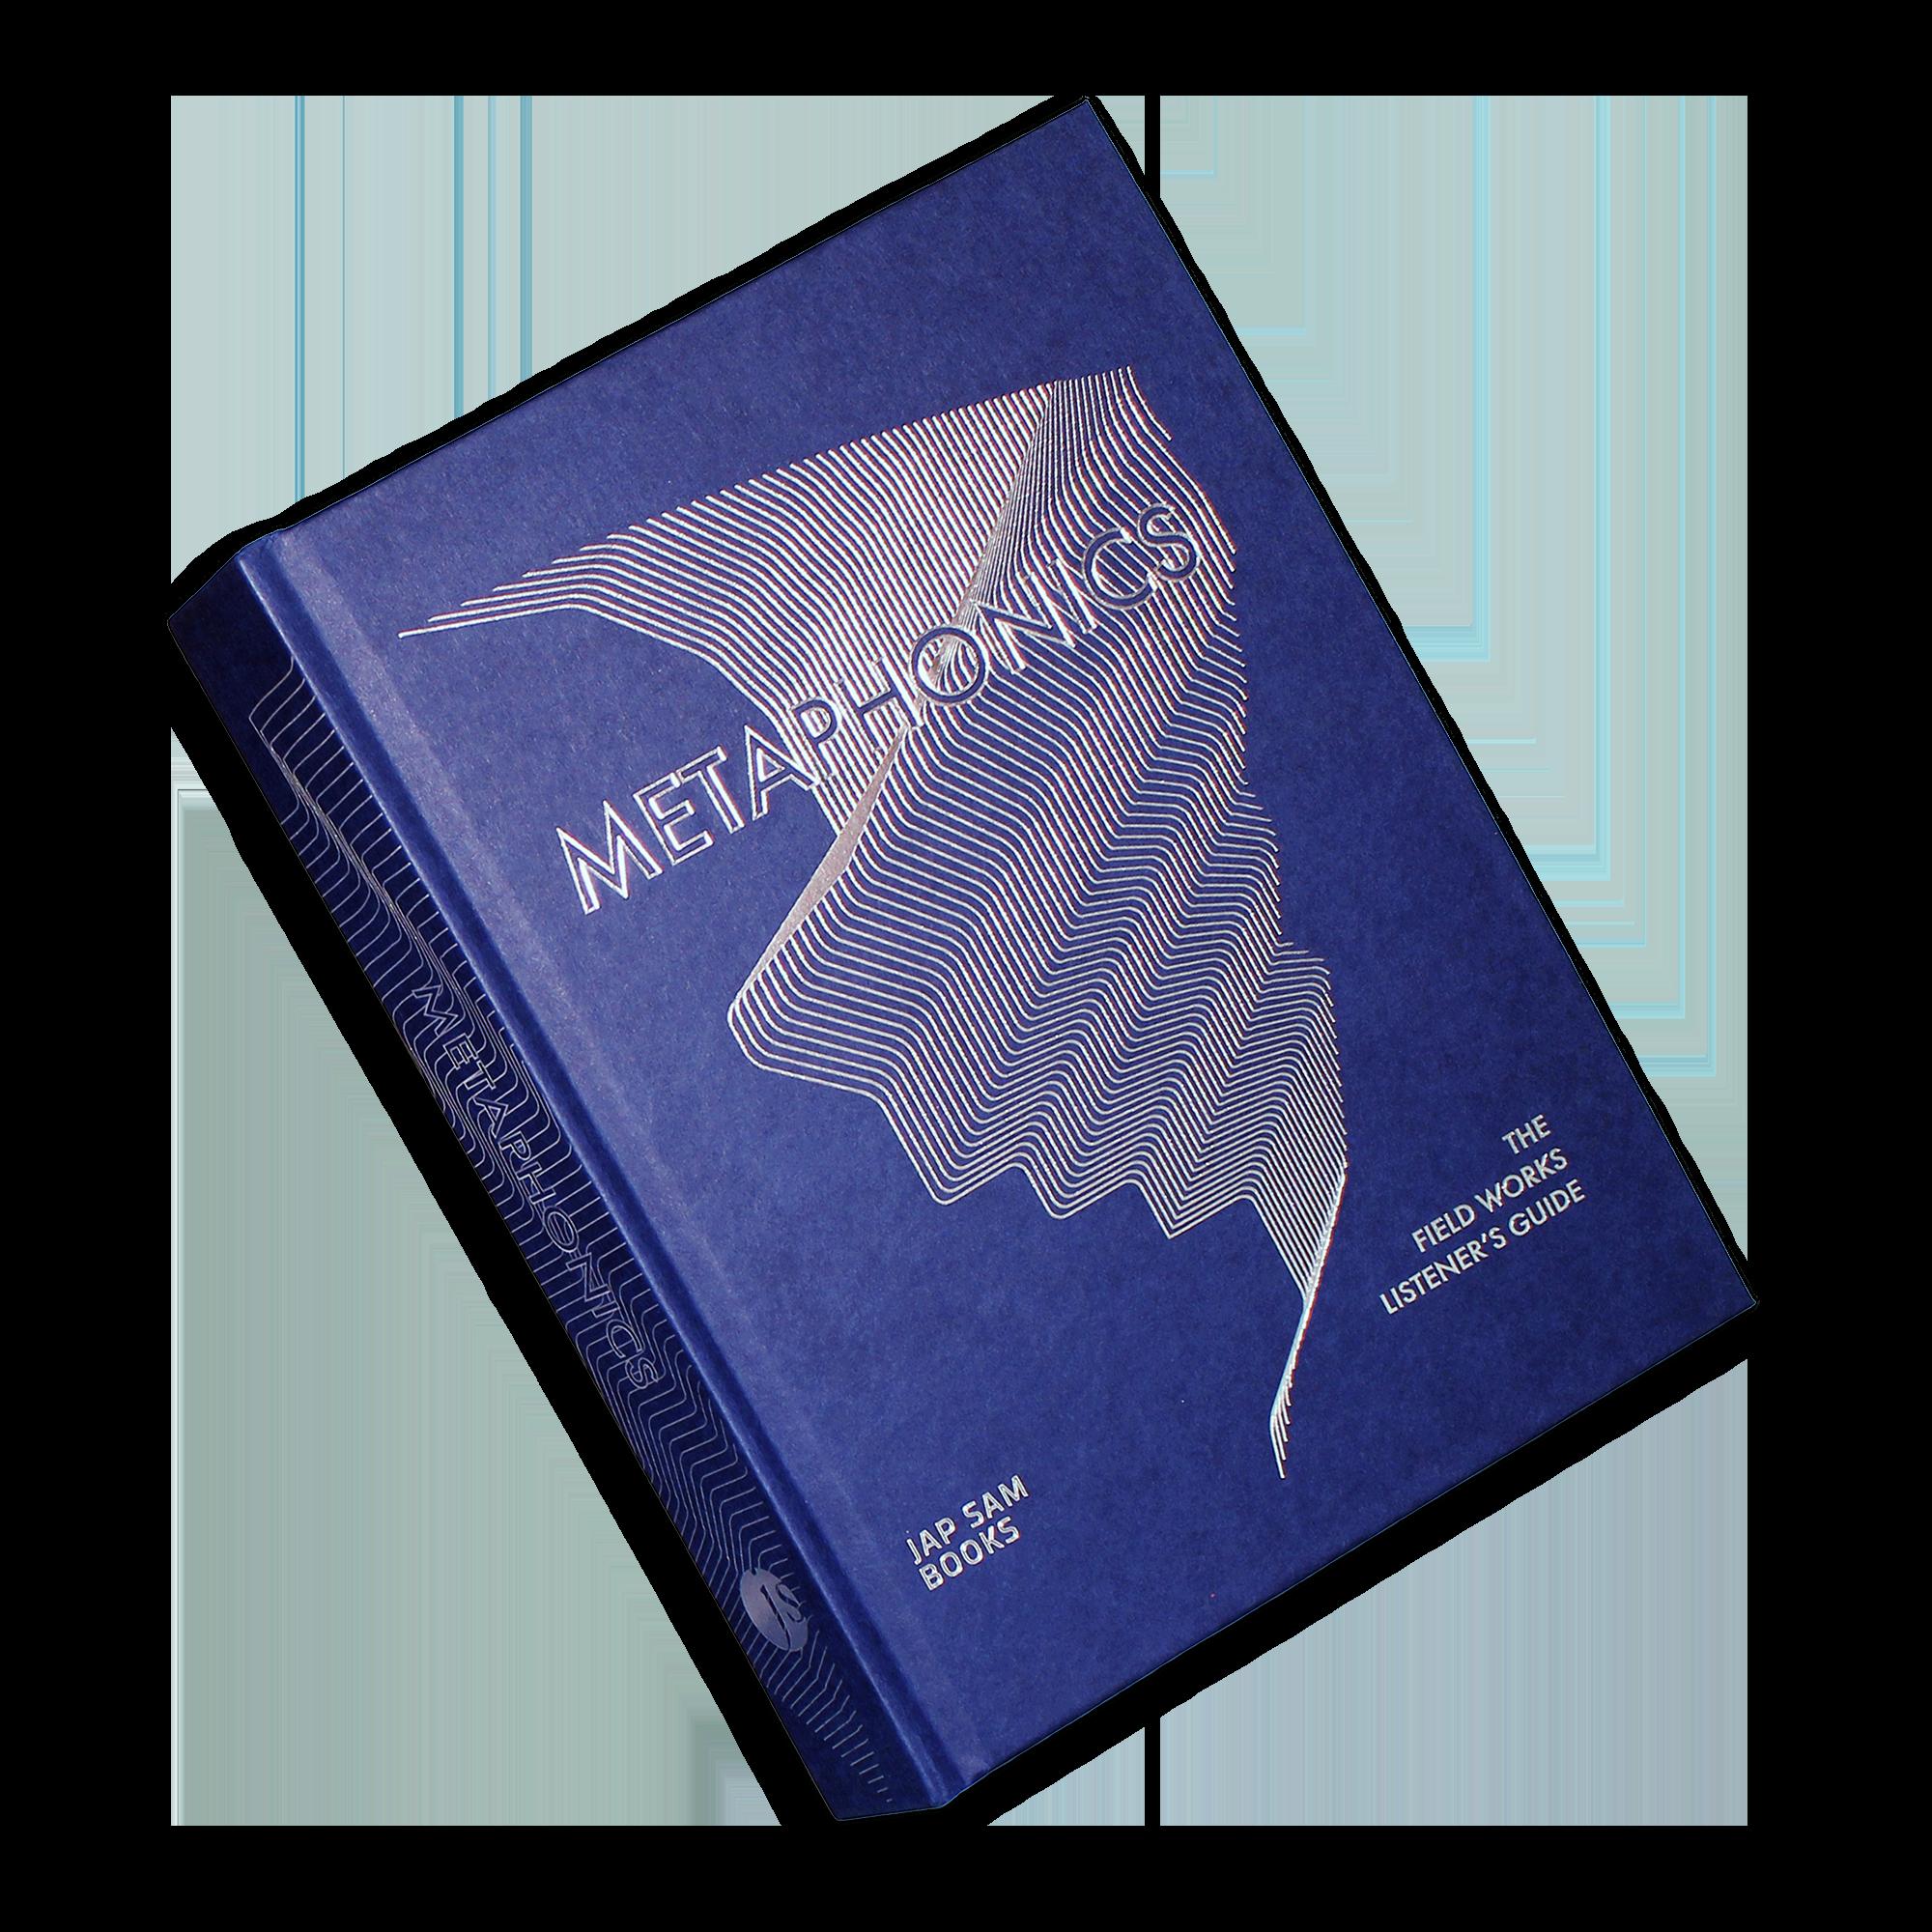 Design, Editing, and Publishing -